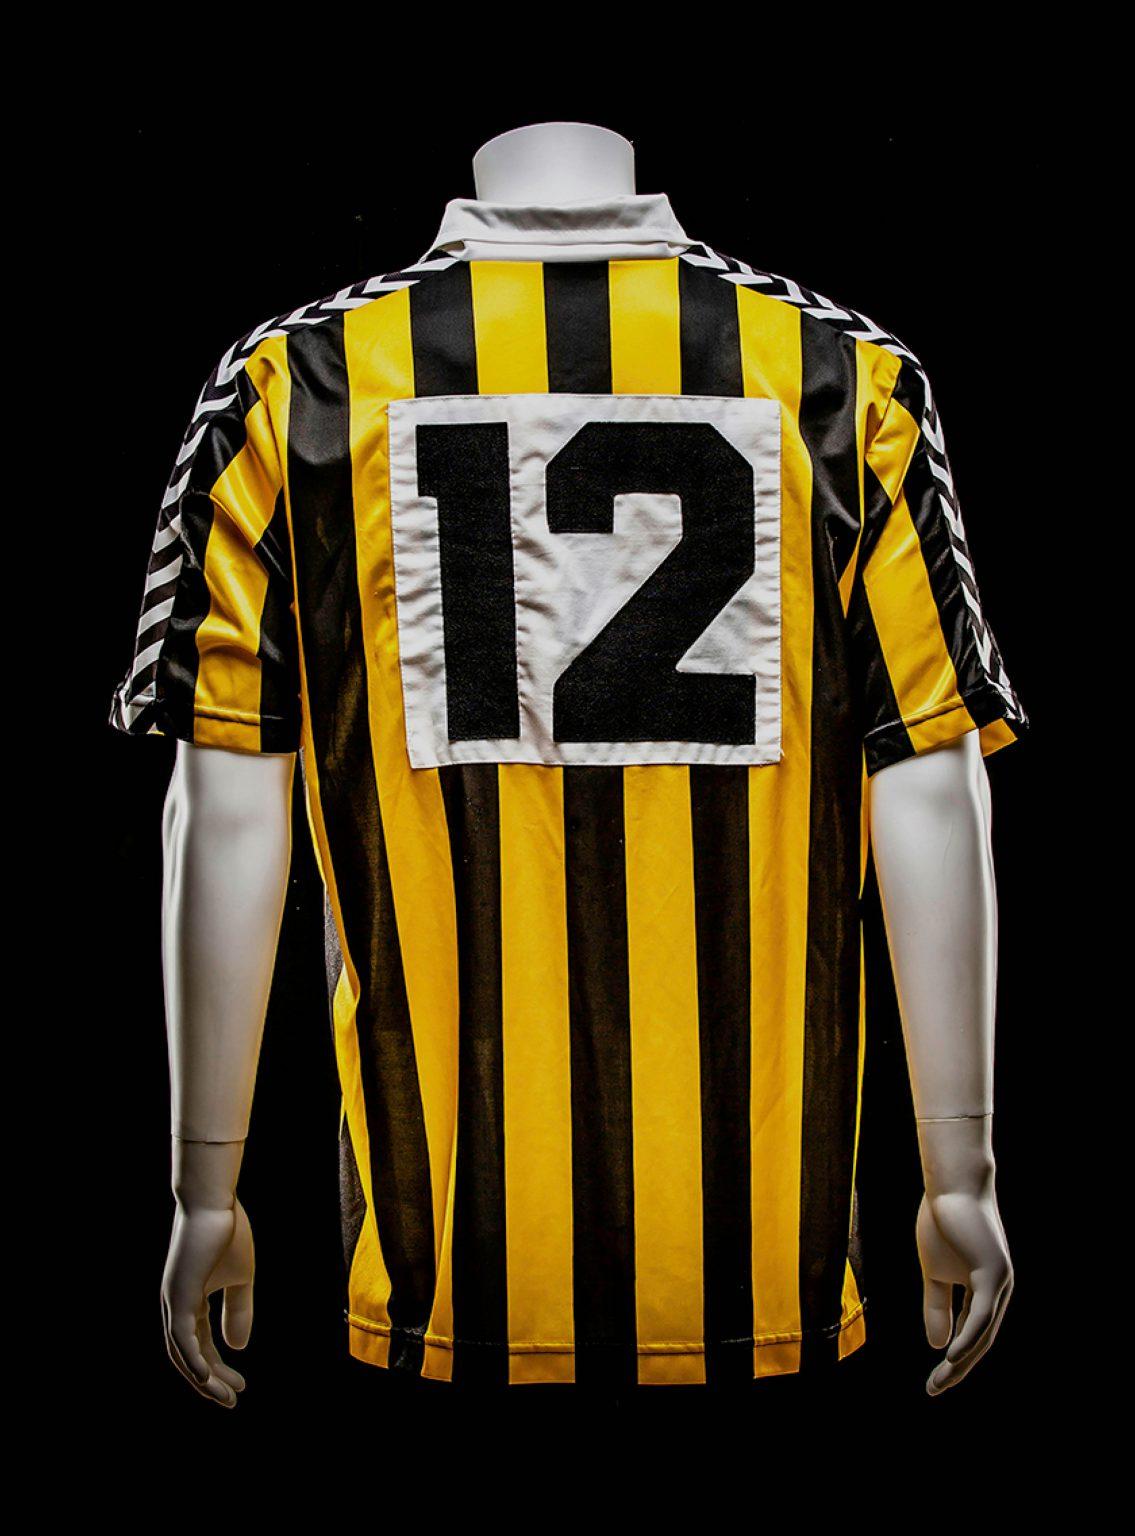 #12 Jurrie Koolhof